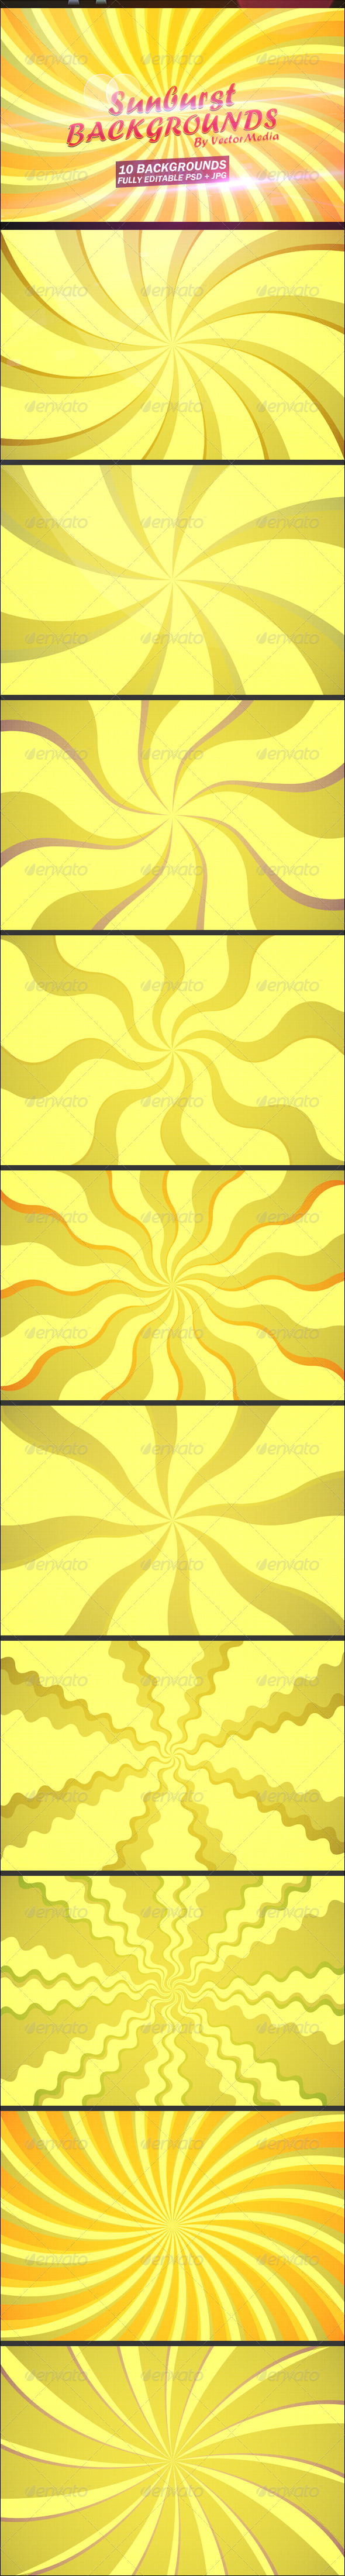 GraphicRiver Sunburst Backgrounds 4707505